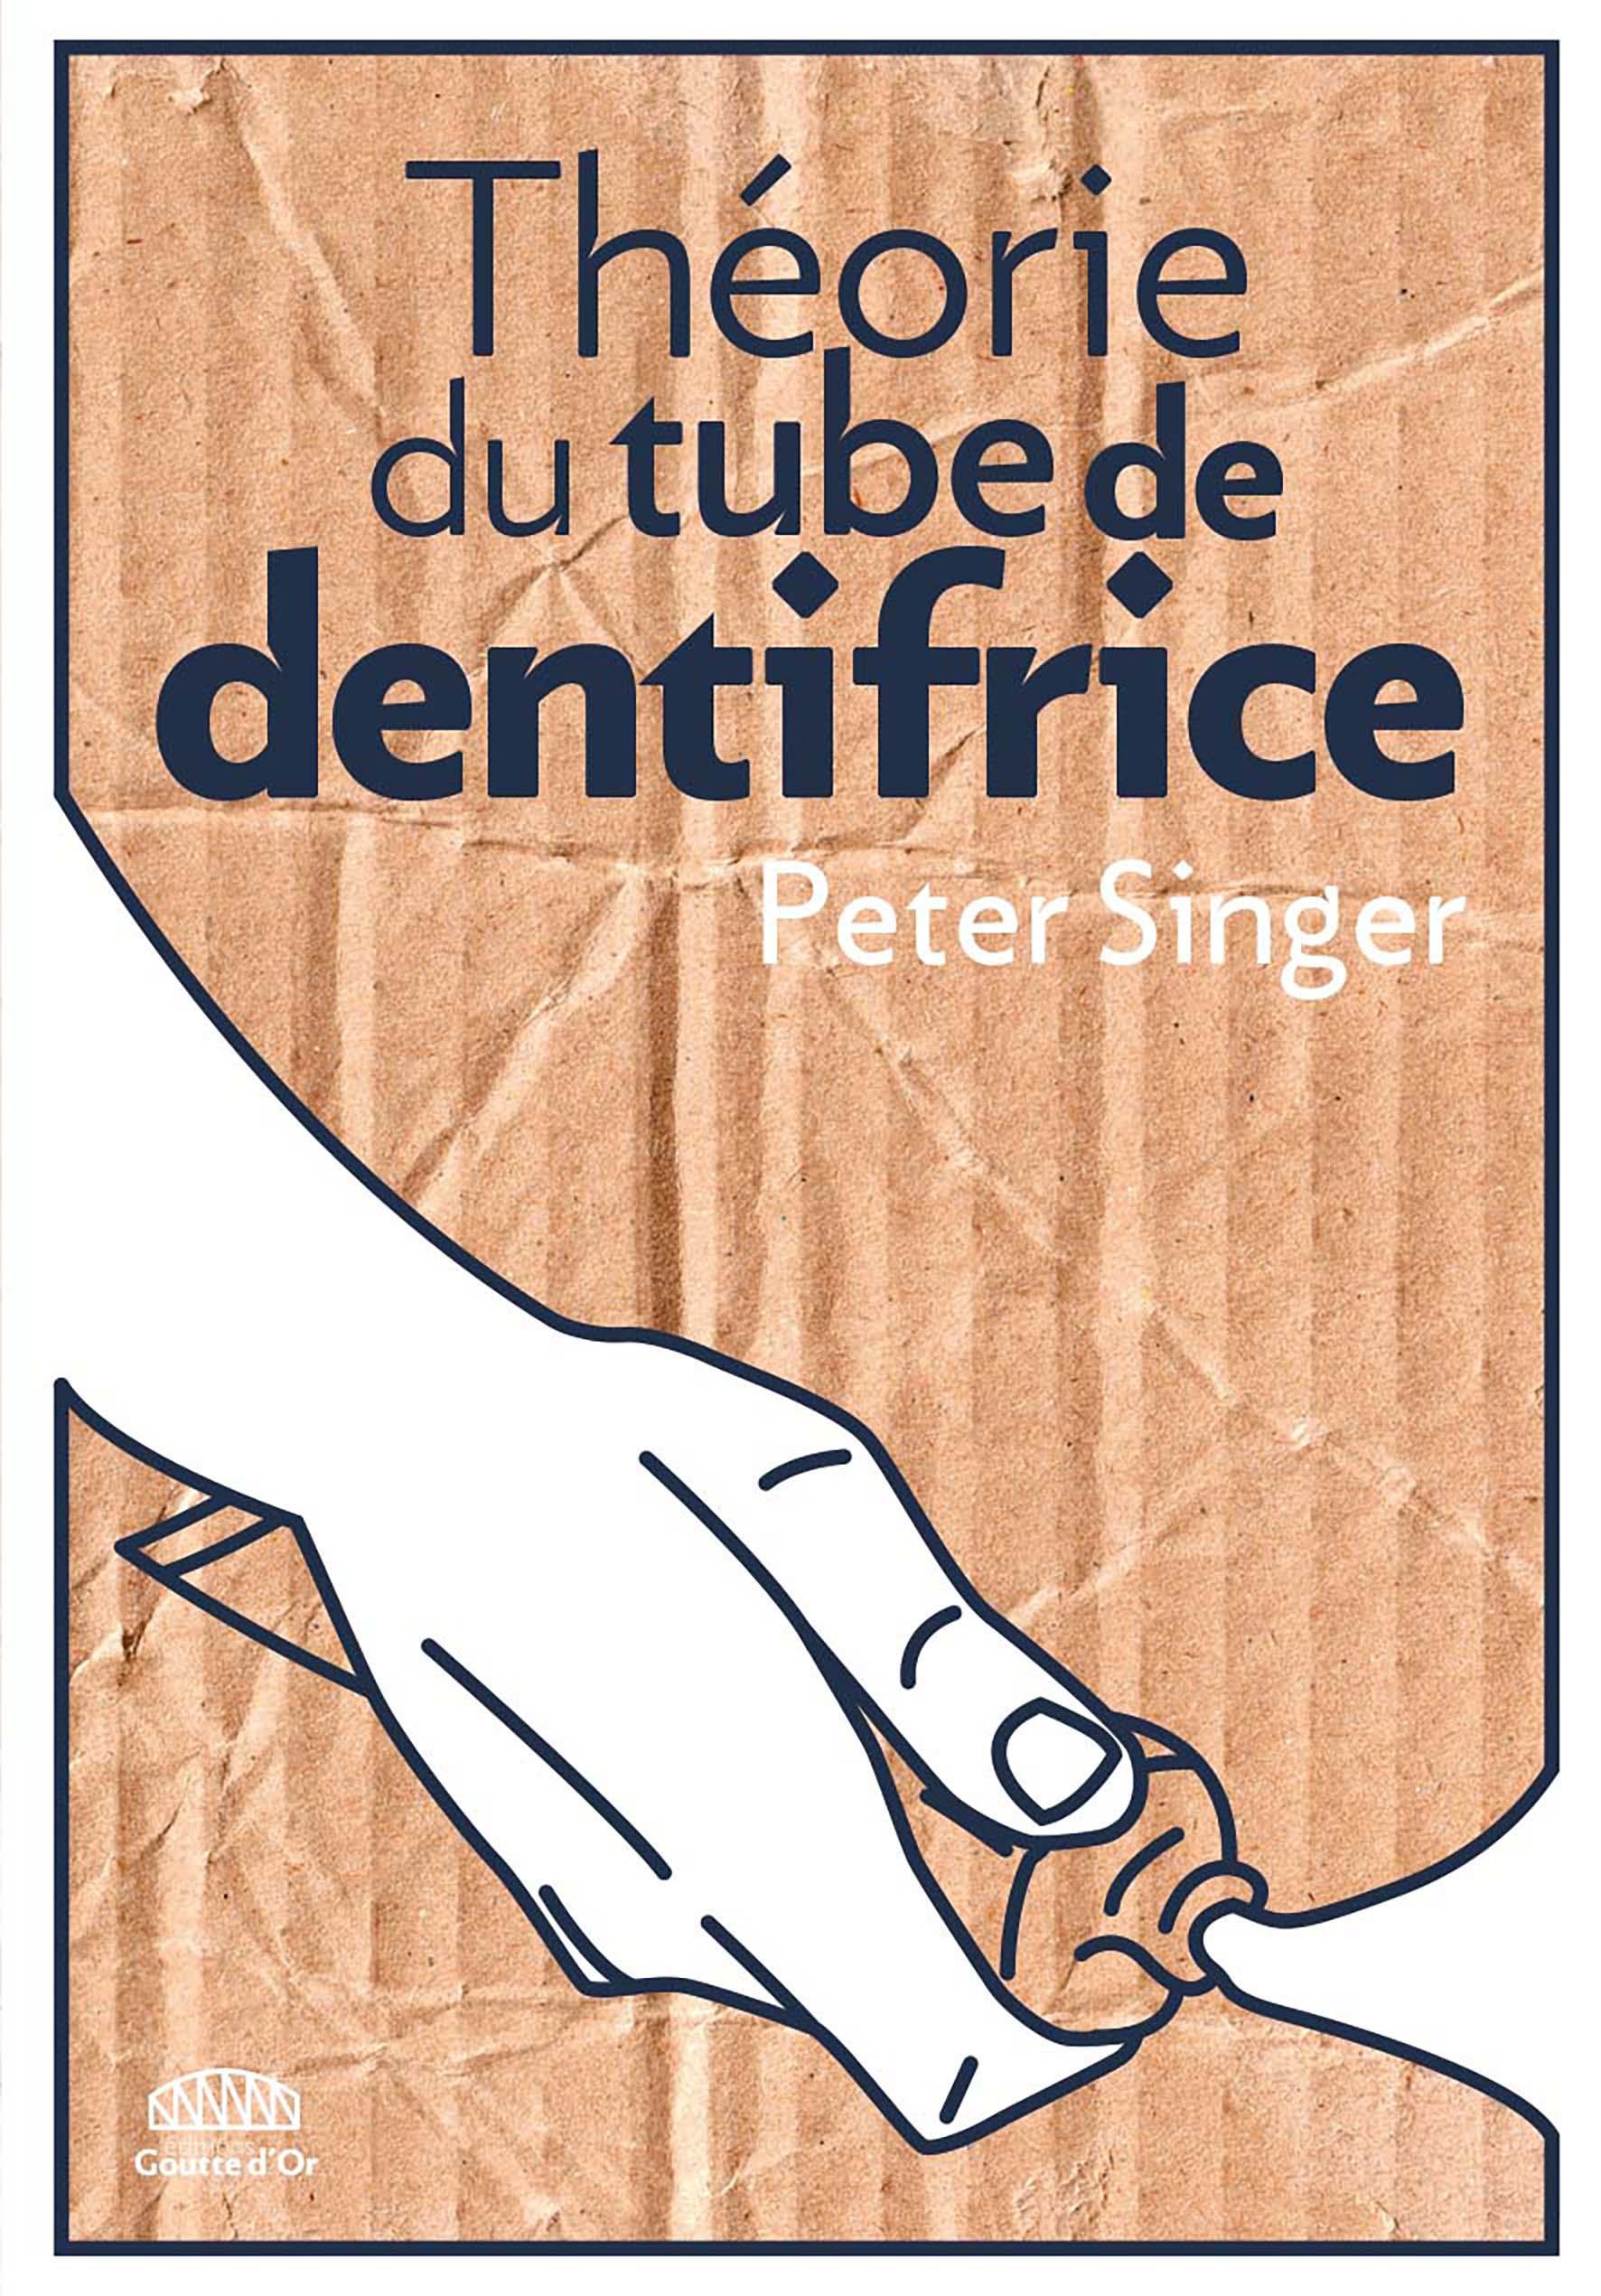 Théorie du tube de dentifrice, Comment changer le monde selon Henry Spira